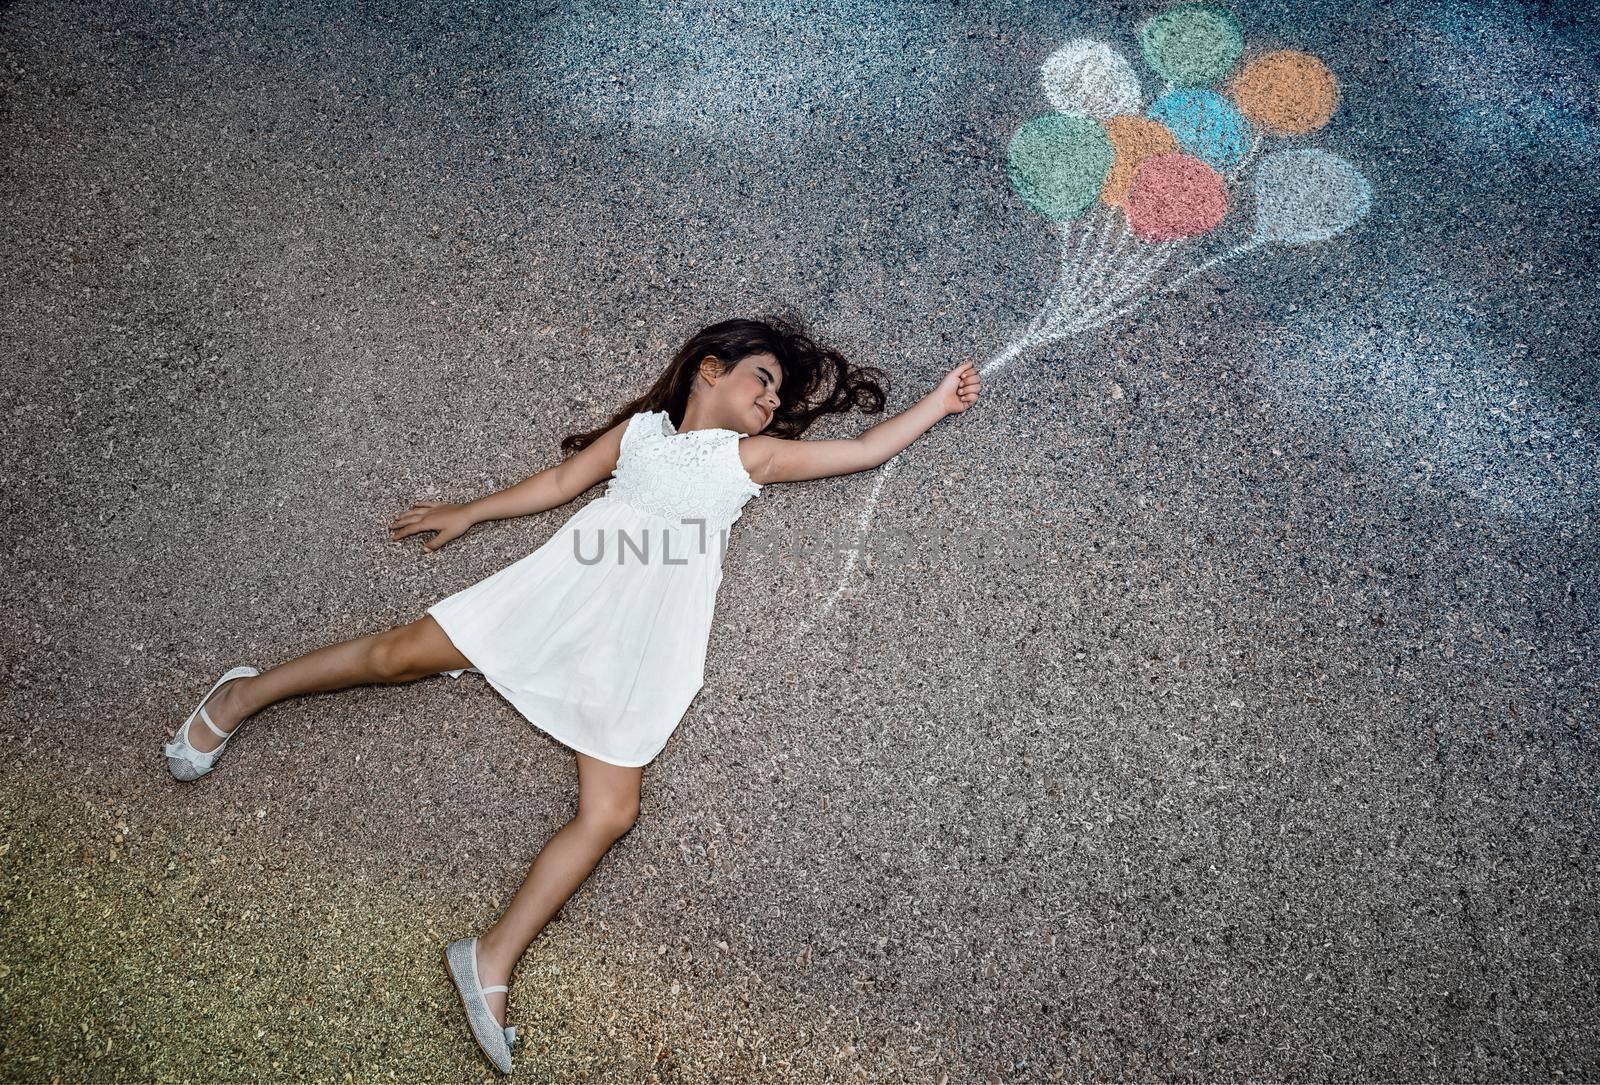 Conceptual Image of Freedom Joy and Happiness. Little Girl Flying Away on Colorful Balloons. Enjoying Life. Dreamy Childhood. Creative Imagination.